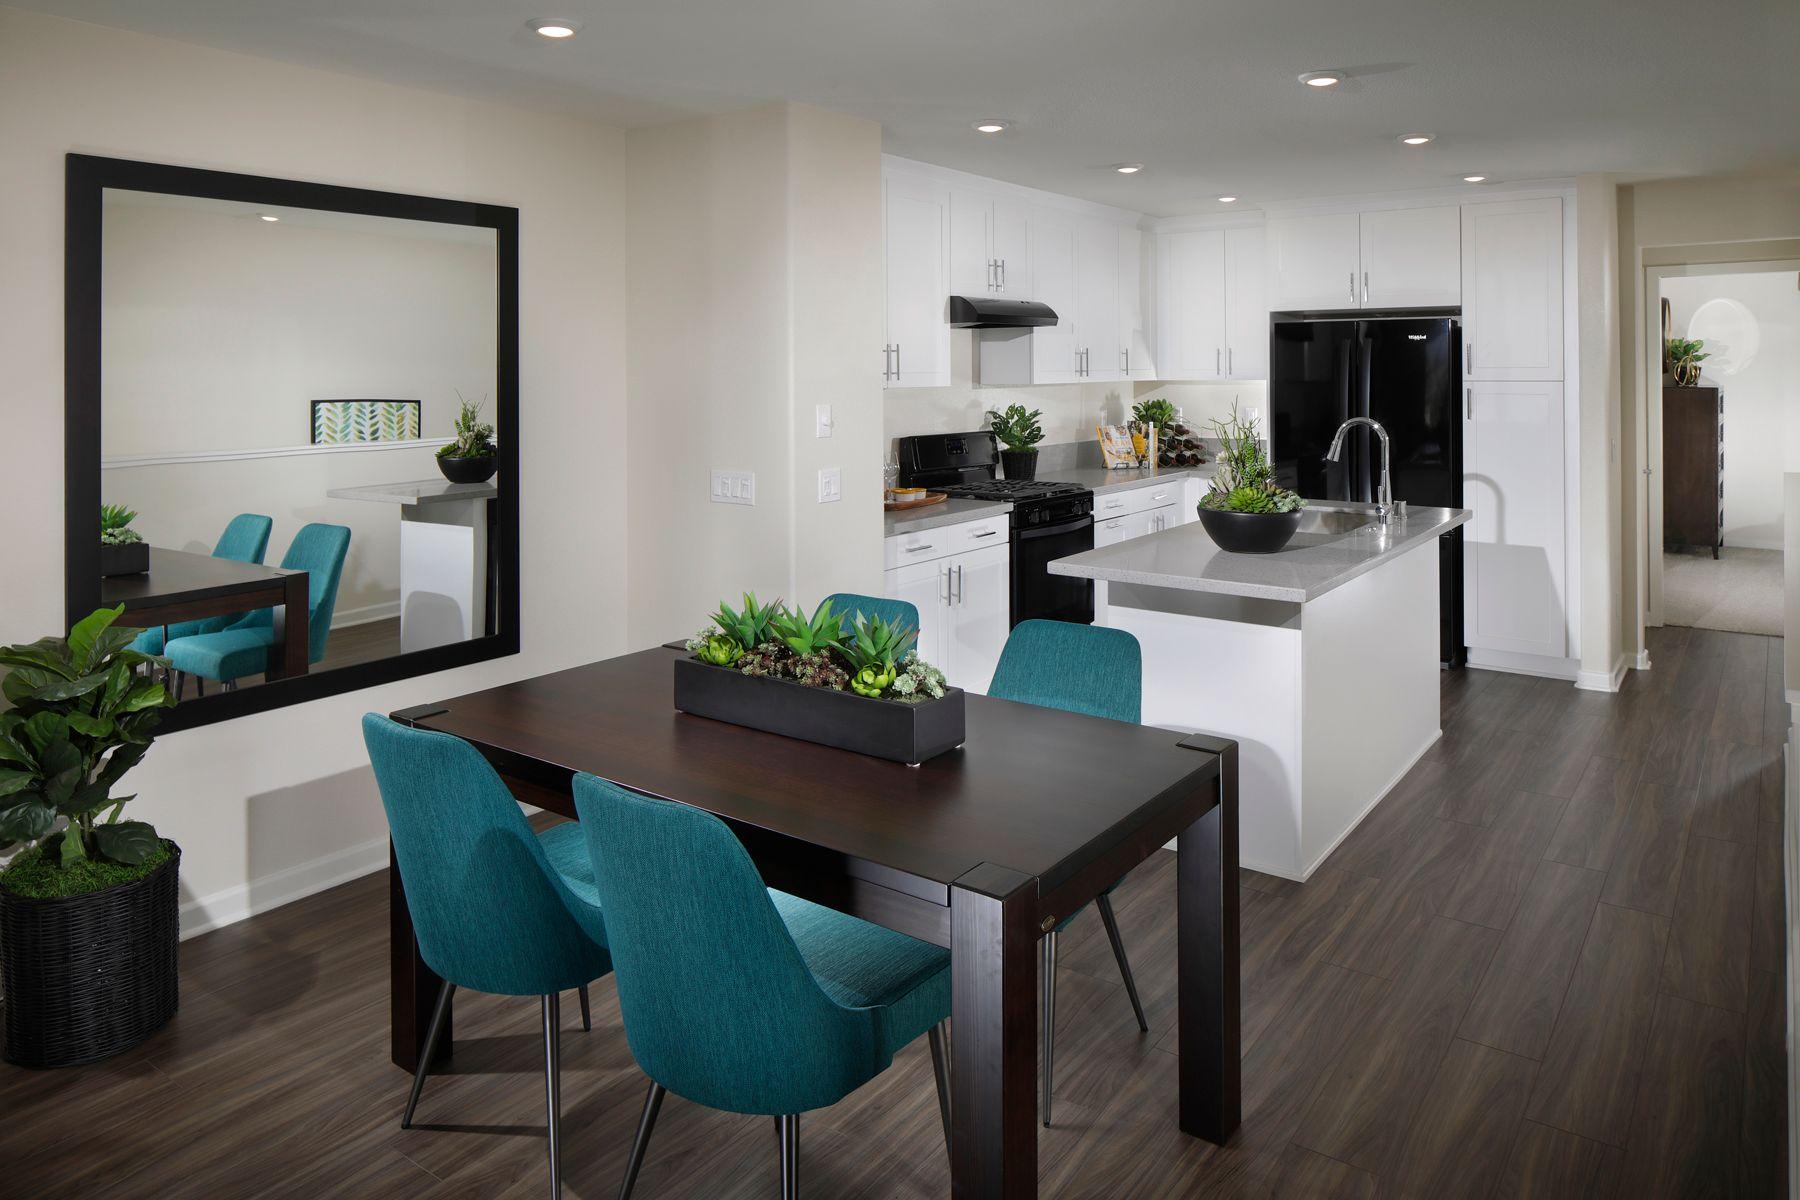 Kitchen featured in the Towns Plan 1 By Century Communities in Riverside-San Bernardino, CA